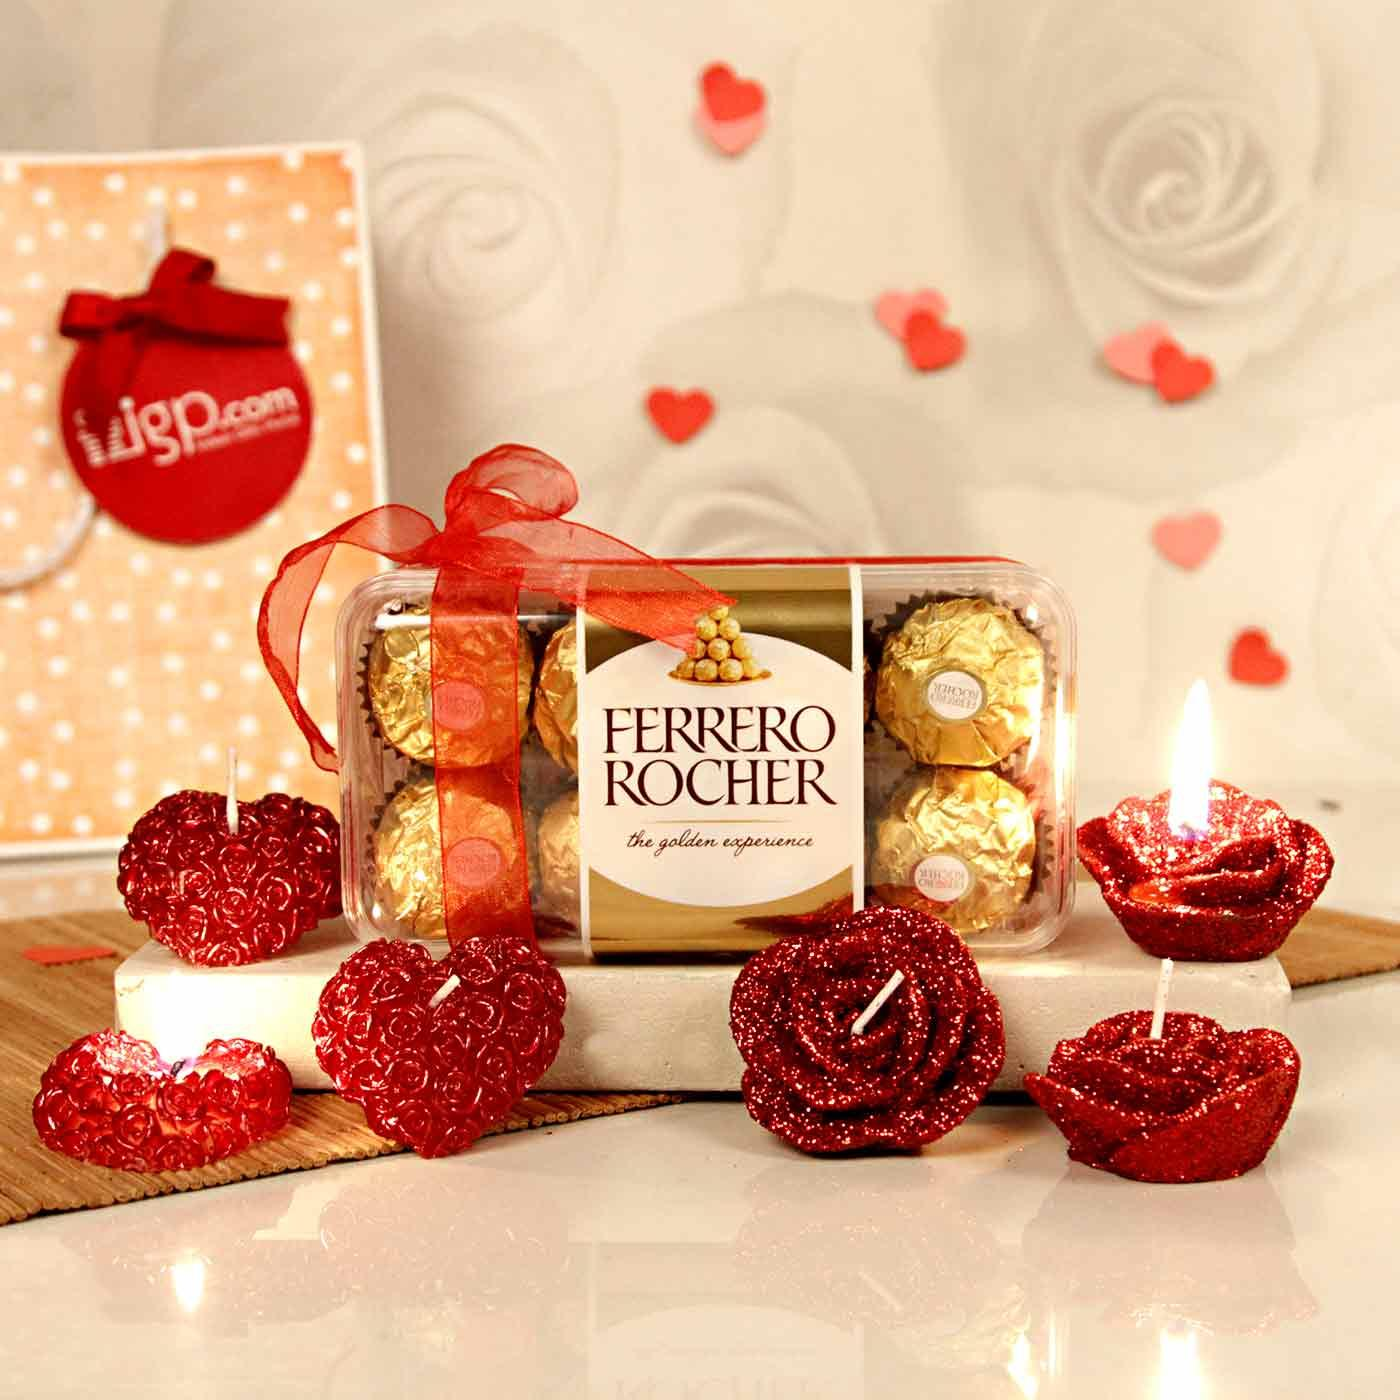 ferro rocher chocolates with romantic candles